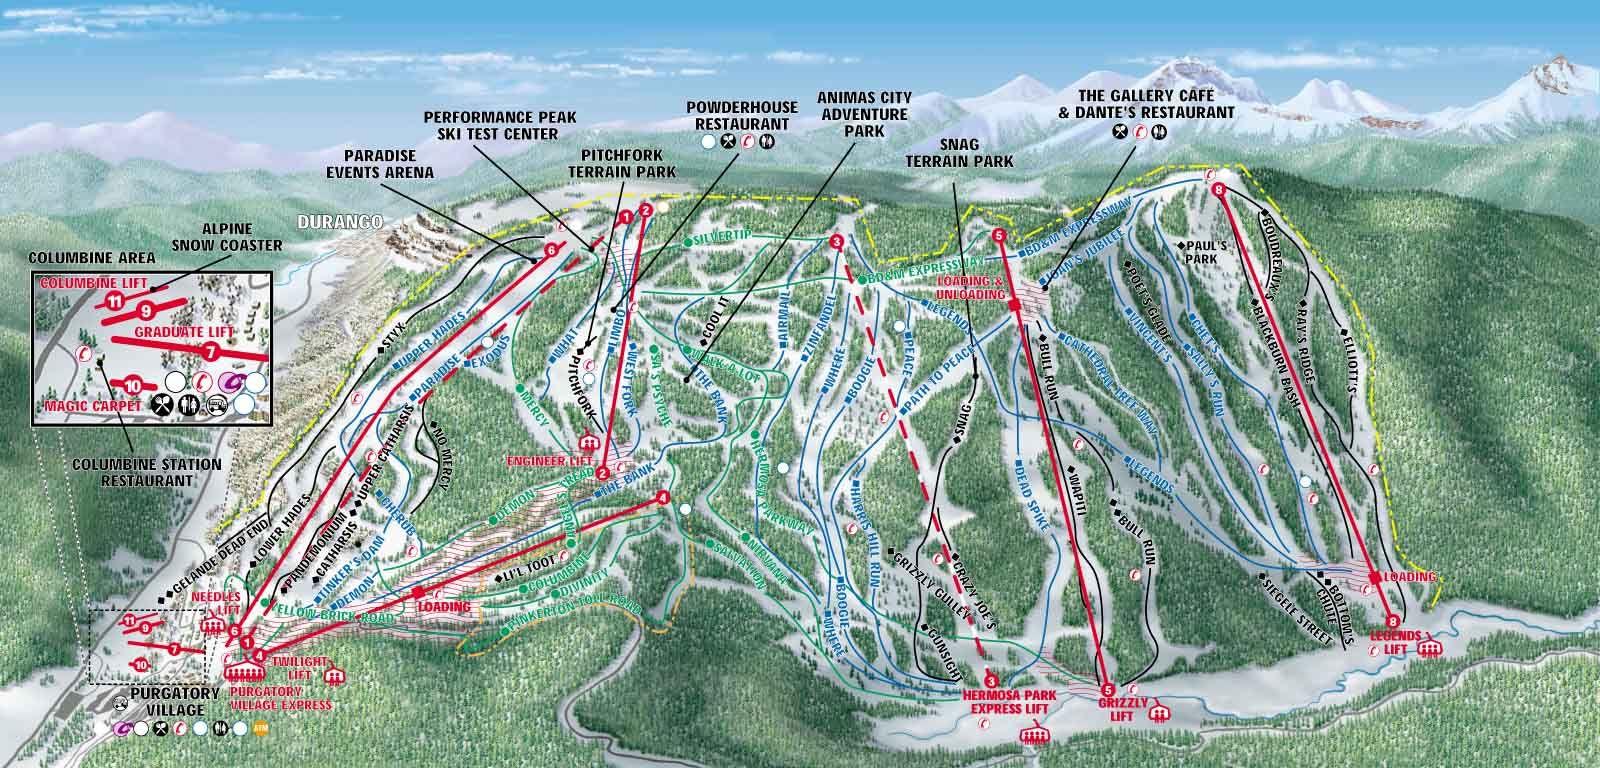 purgatory ski resort--durango, colorado. received pe credit from ft